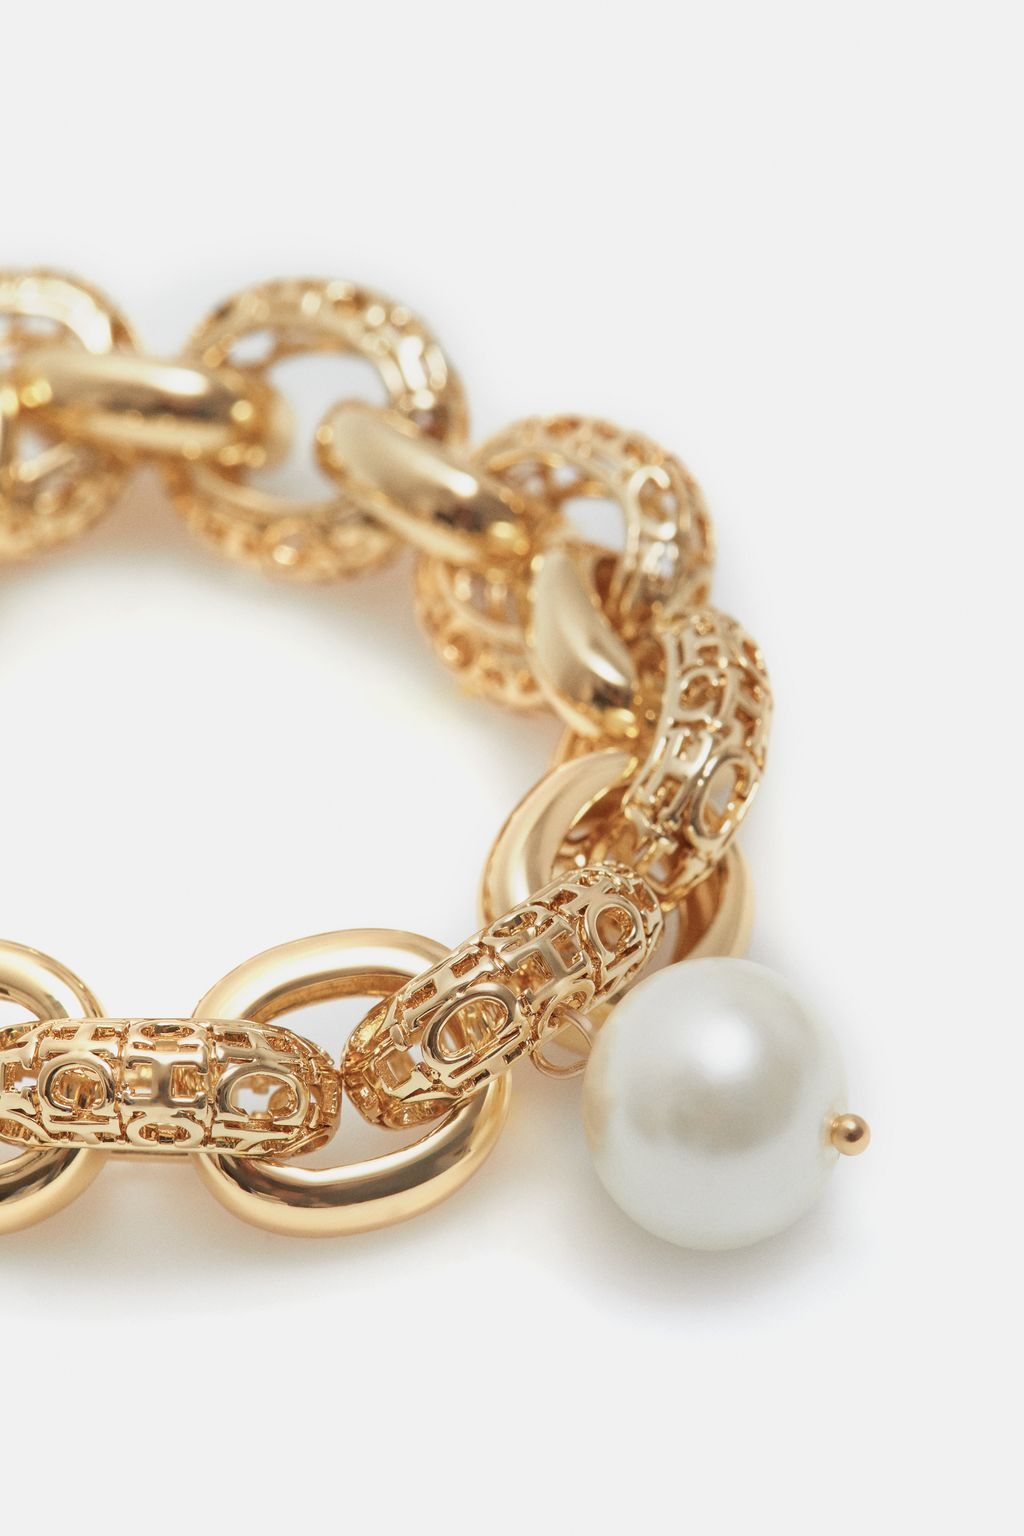 CH Maillon bracelet